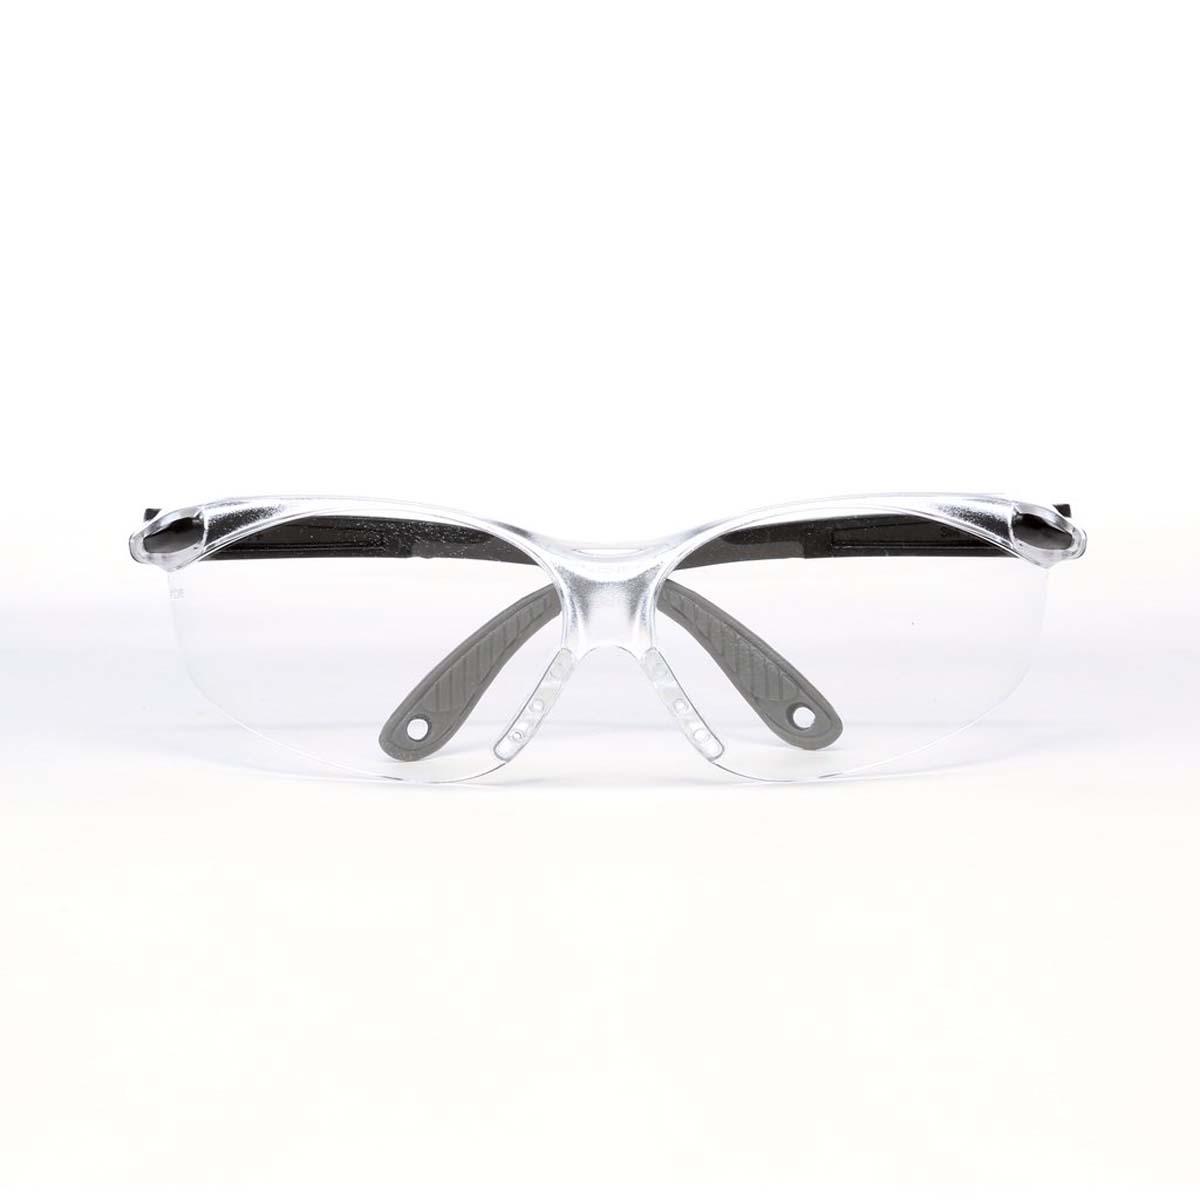 "3Mâ""¢ Virtuaâ""¢ V4 Protective Eyewear 11672-00000-20 Clear Anti-Fog Lens, Black/Gray Temple"